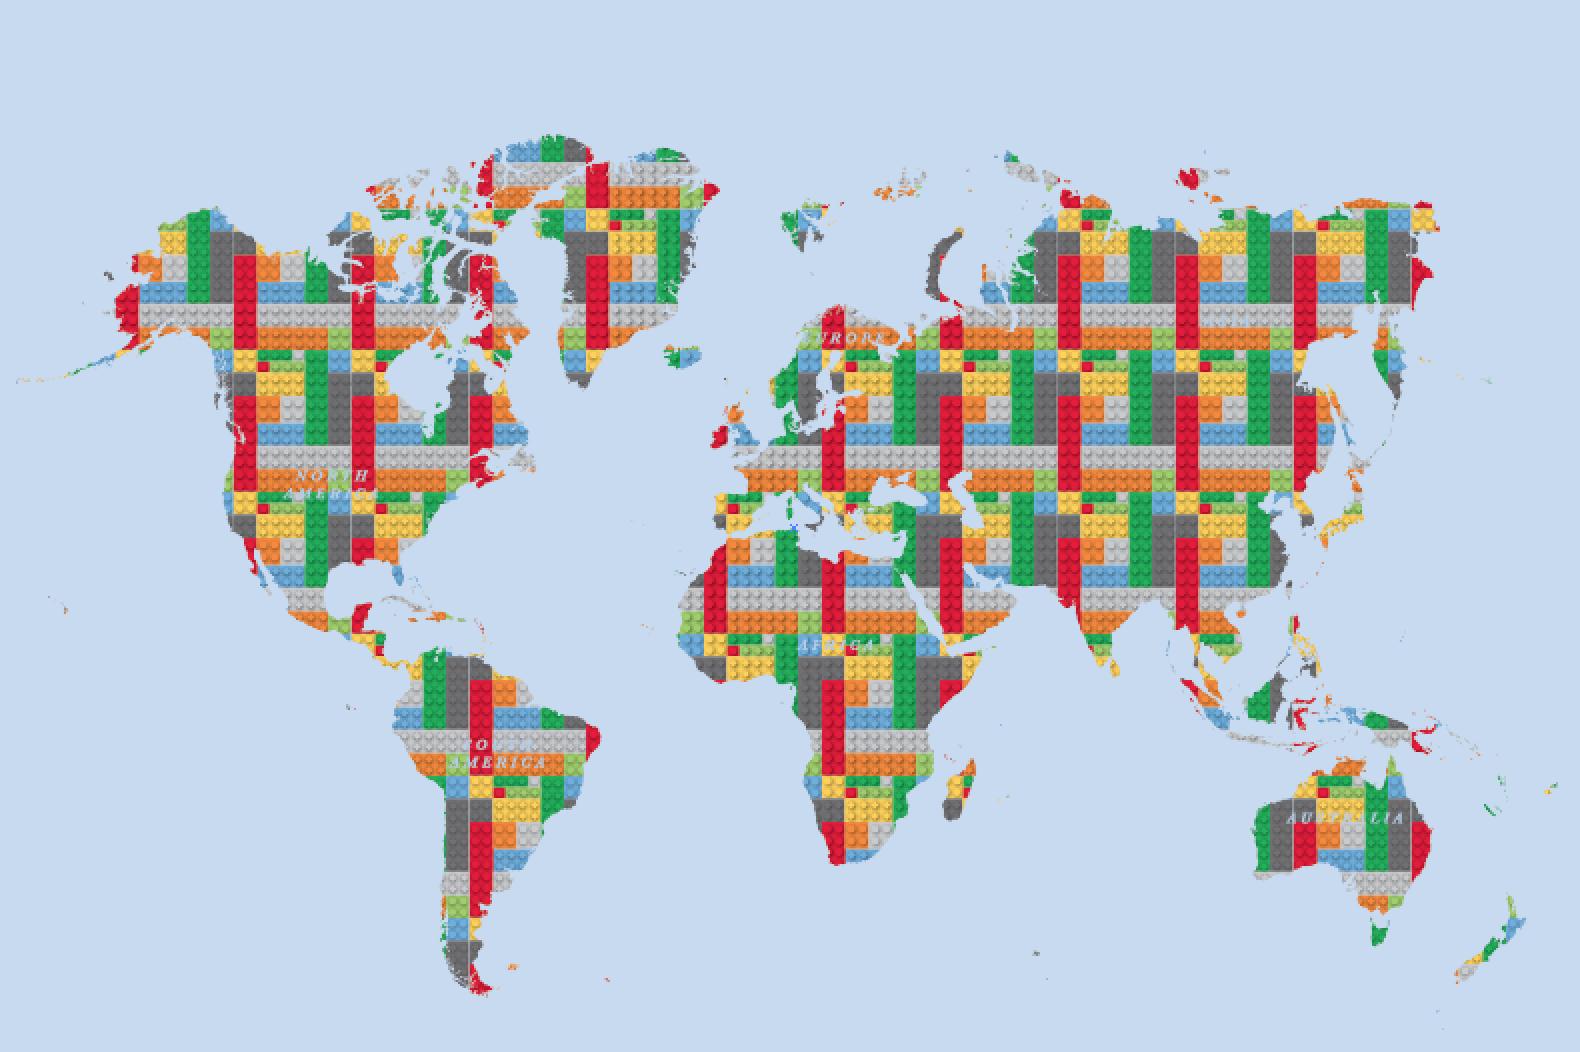 Lego world map cvln rp lego world map gumiabroncs Images